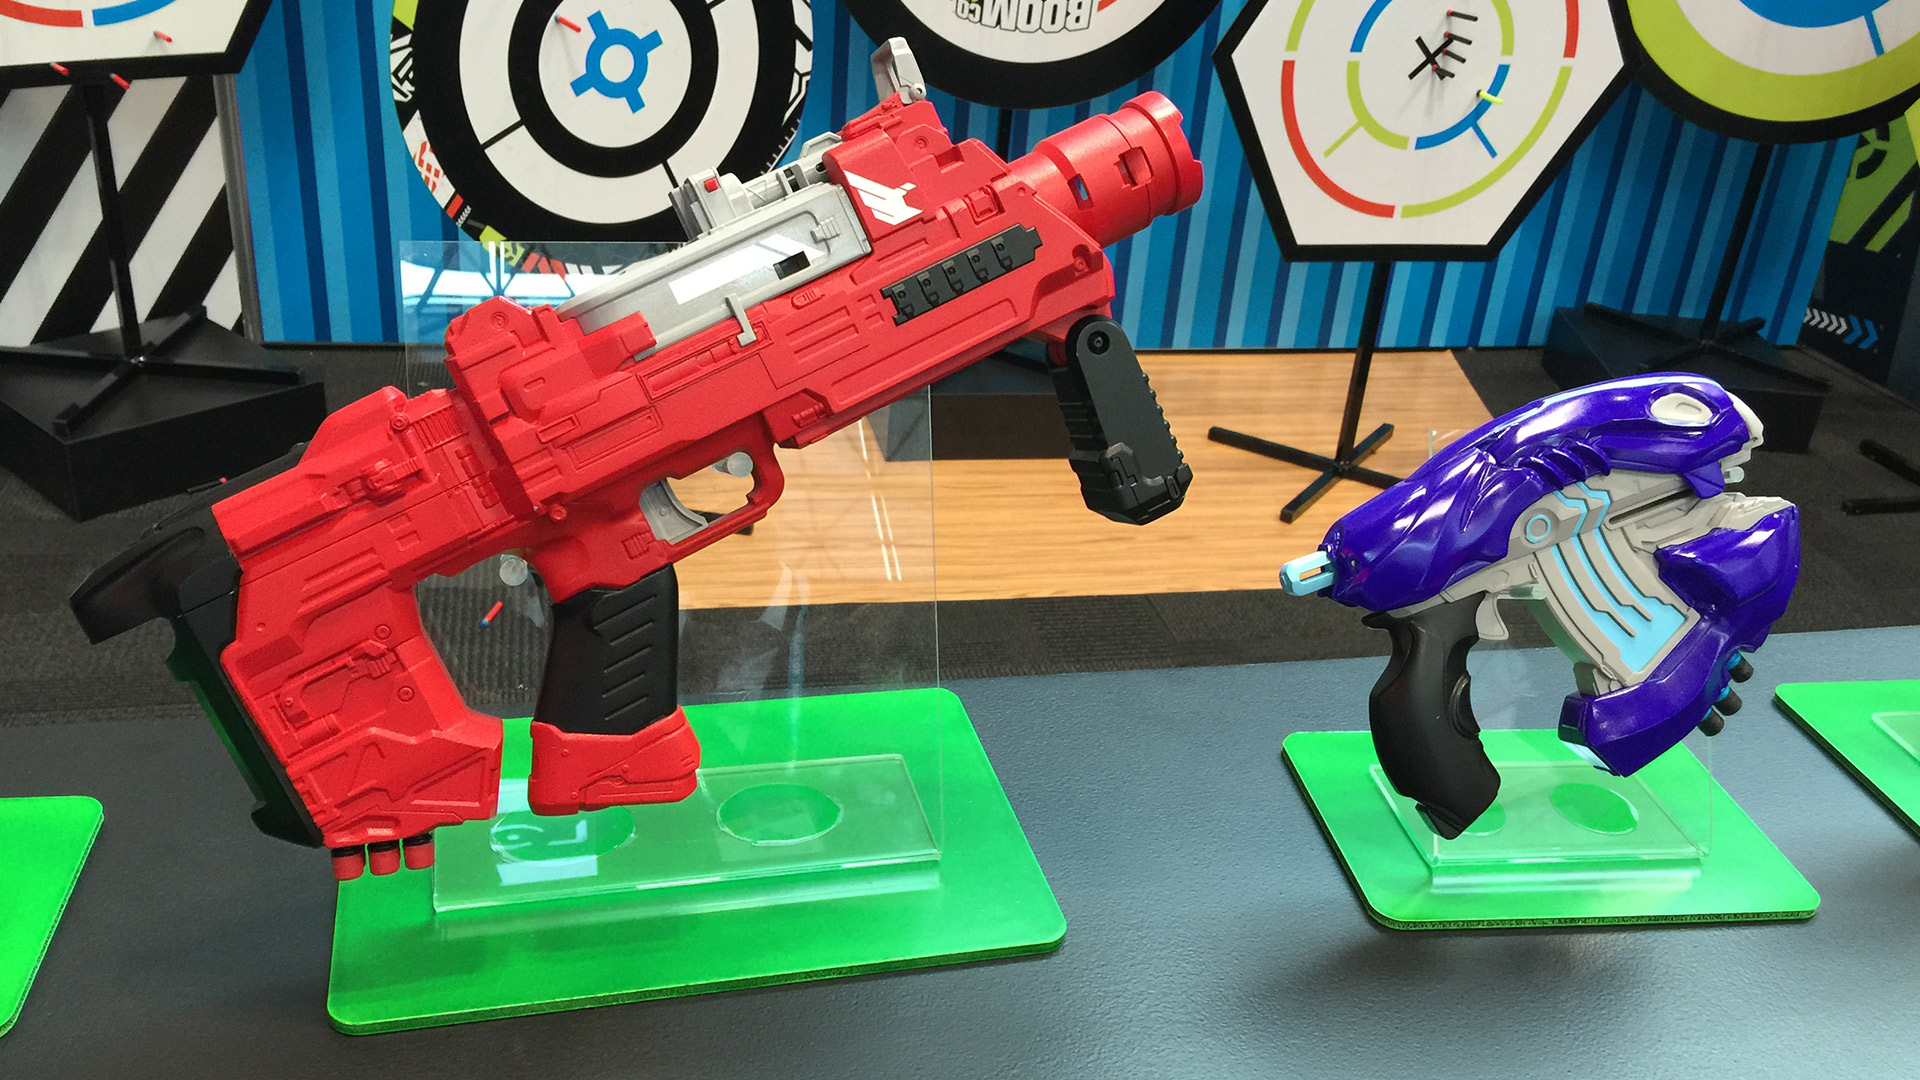 Custom Halo Inspired Nerf Firestrike pistol prop by firebladecomics on  DeviantArt